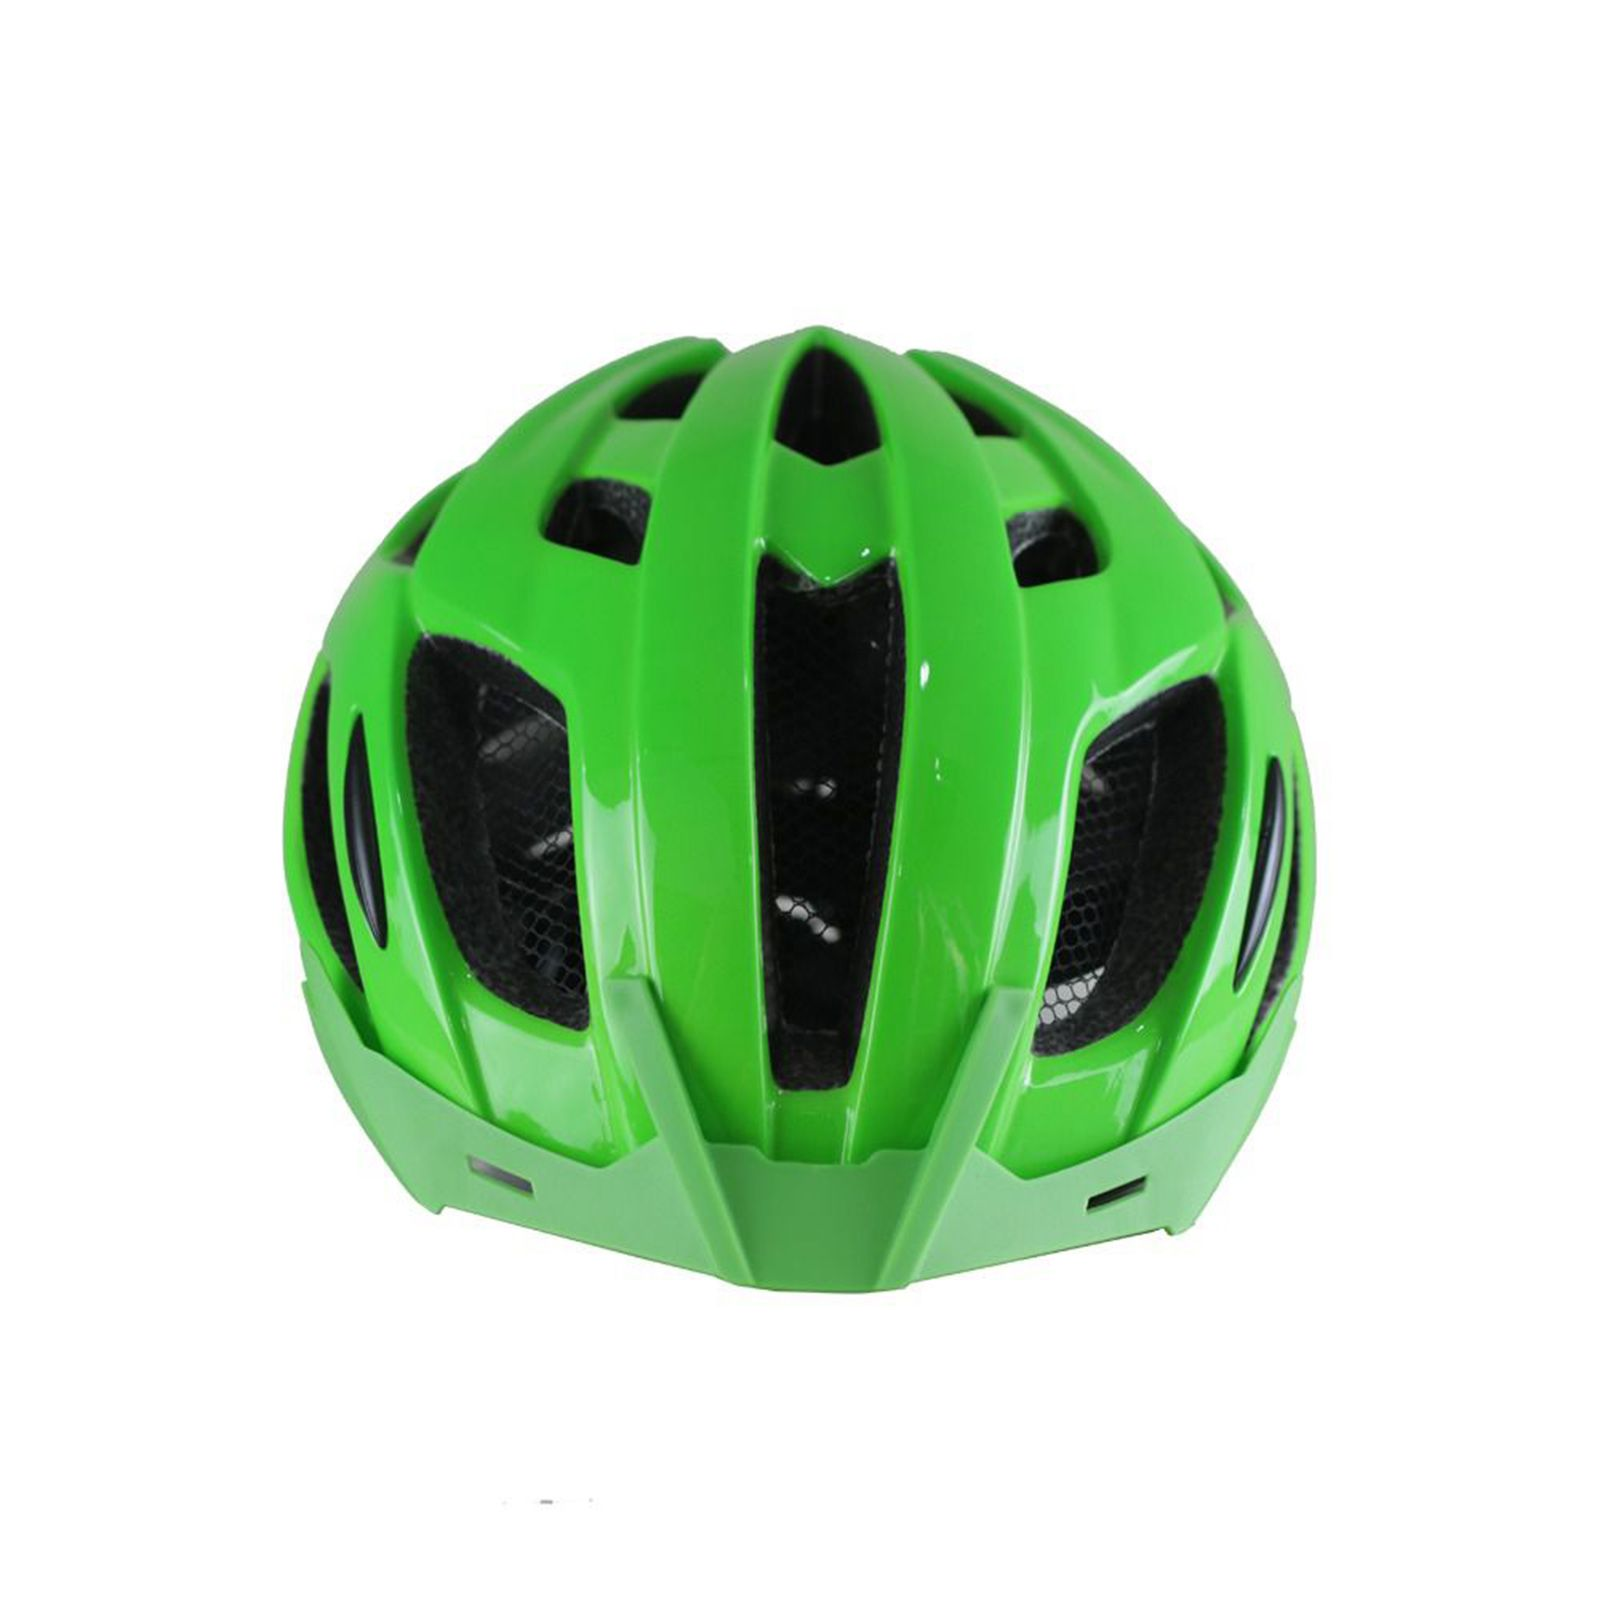 Capacete Ciclismo Fluig Diversas Cores c/ Sinalizador Led - First